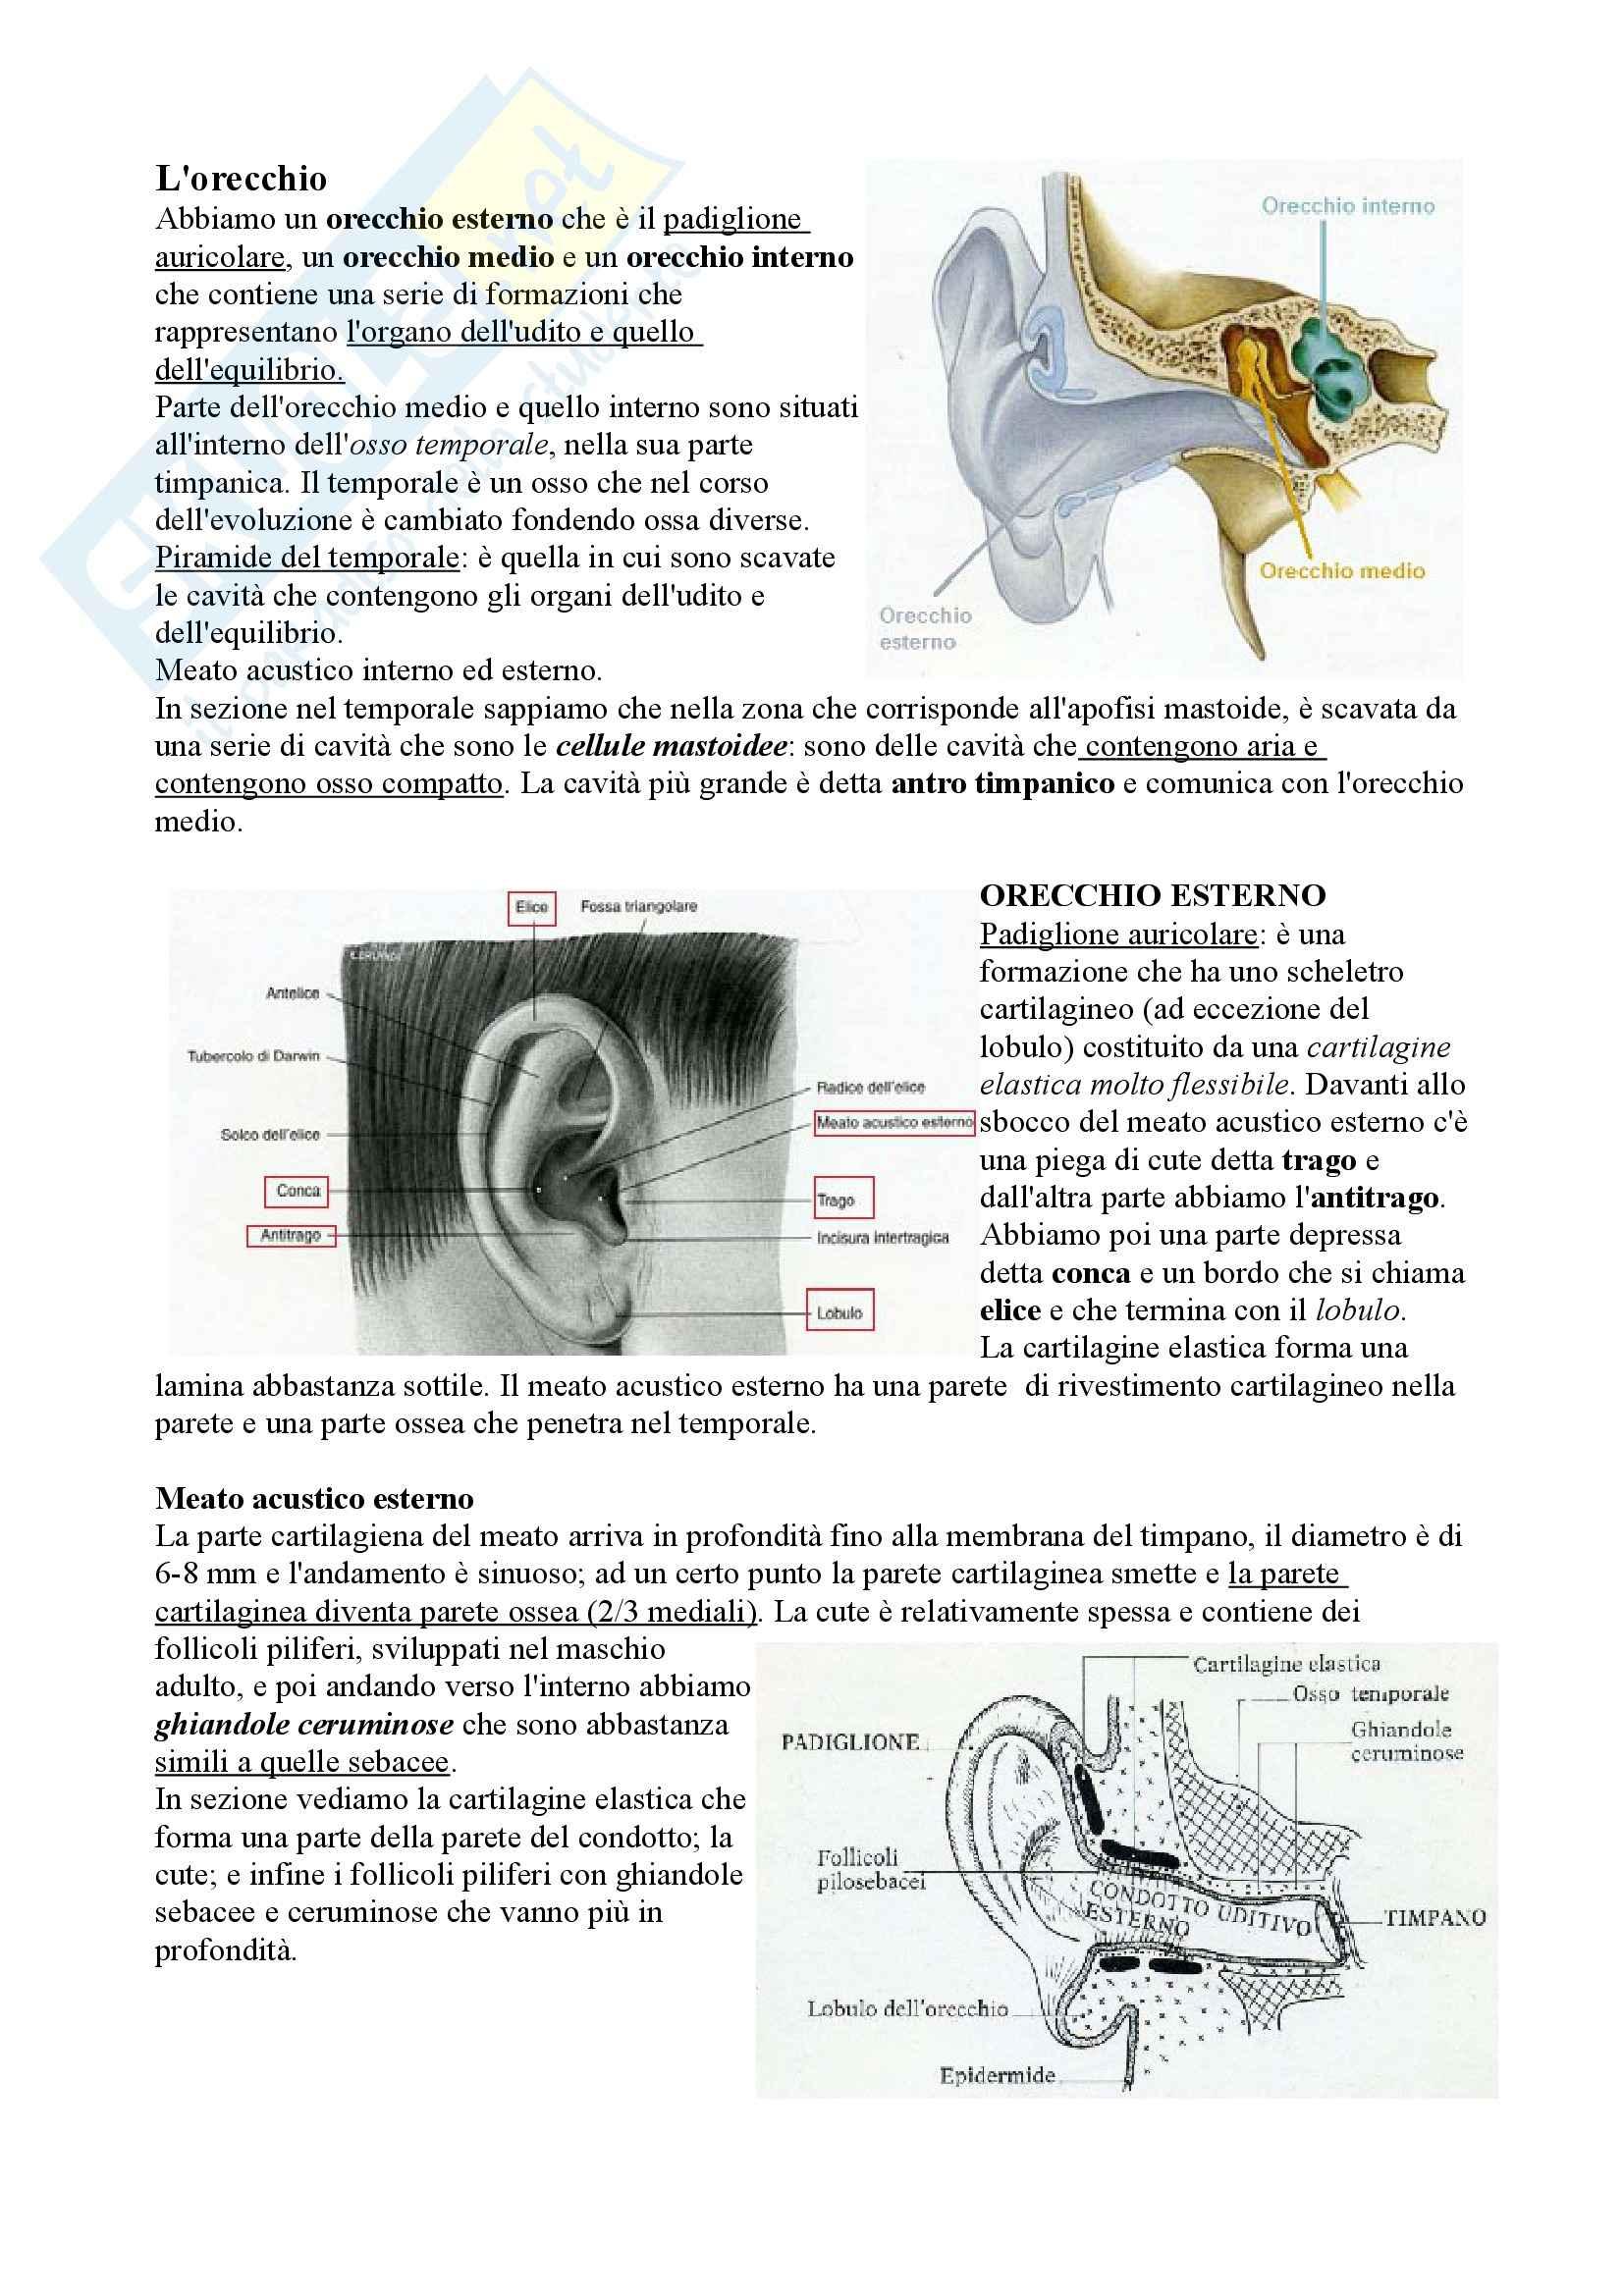 Orecchio, Anatomia